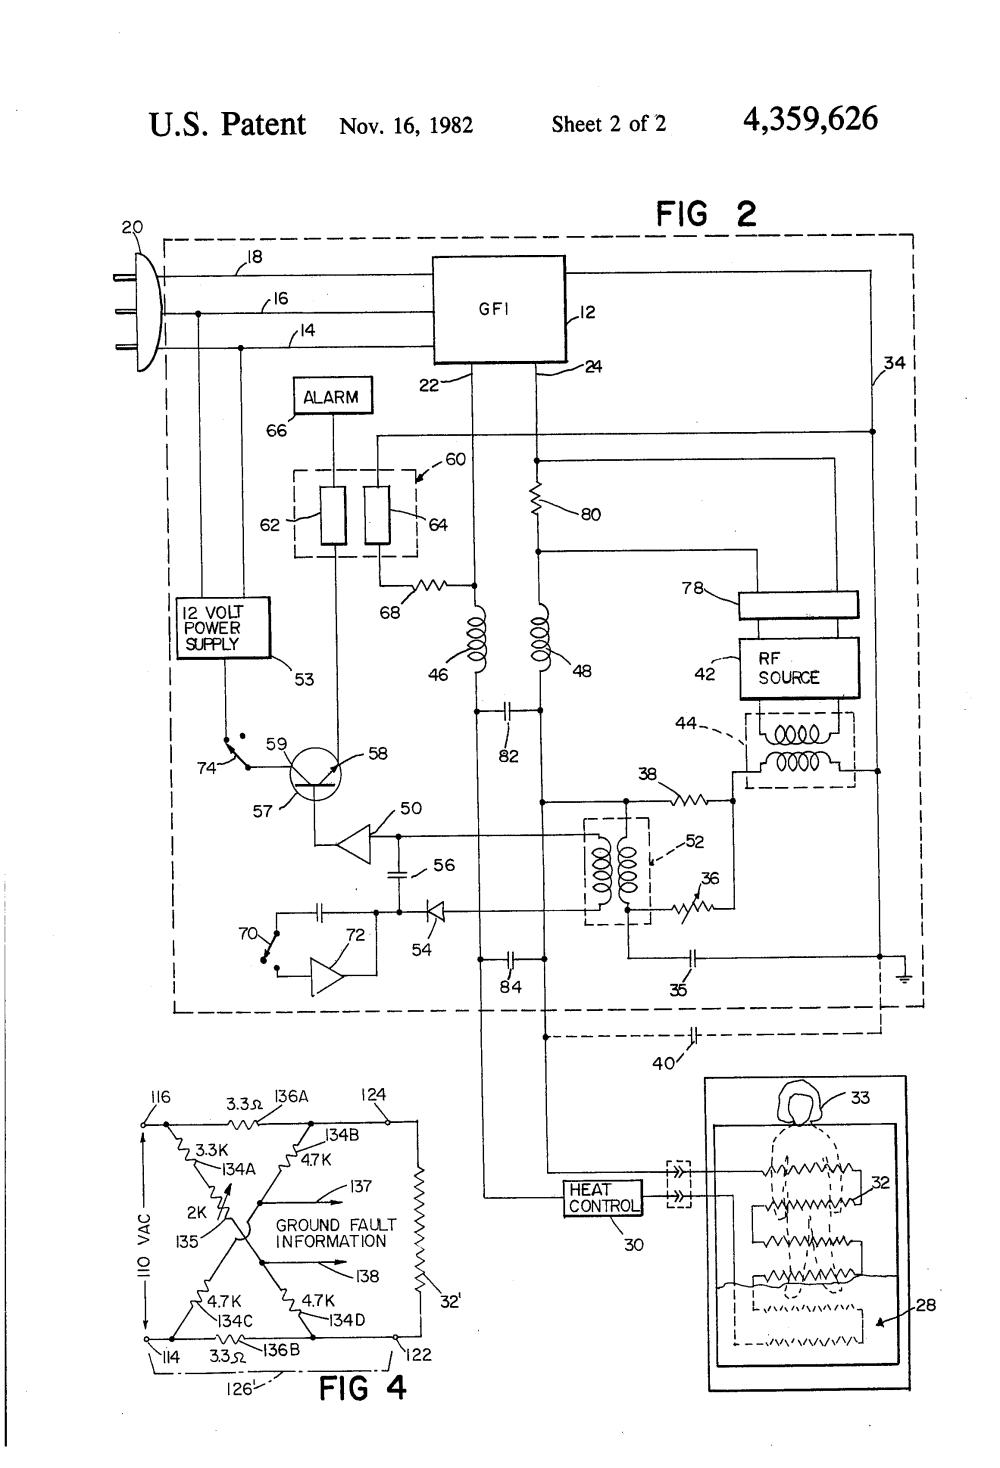 medium resolution of wiring diagram for electric blanket sunbeam wiring diagrams konsultwiring diagram for electric blanket wiring diagram centre